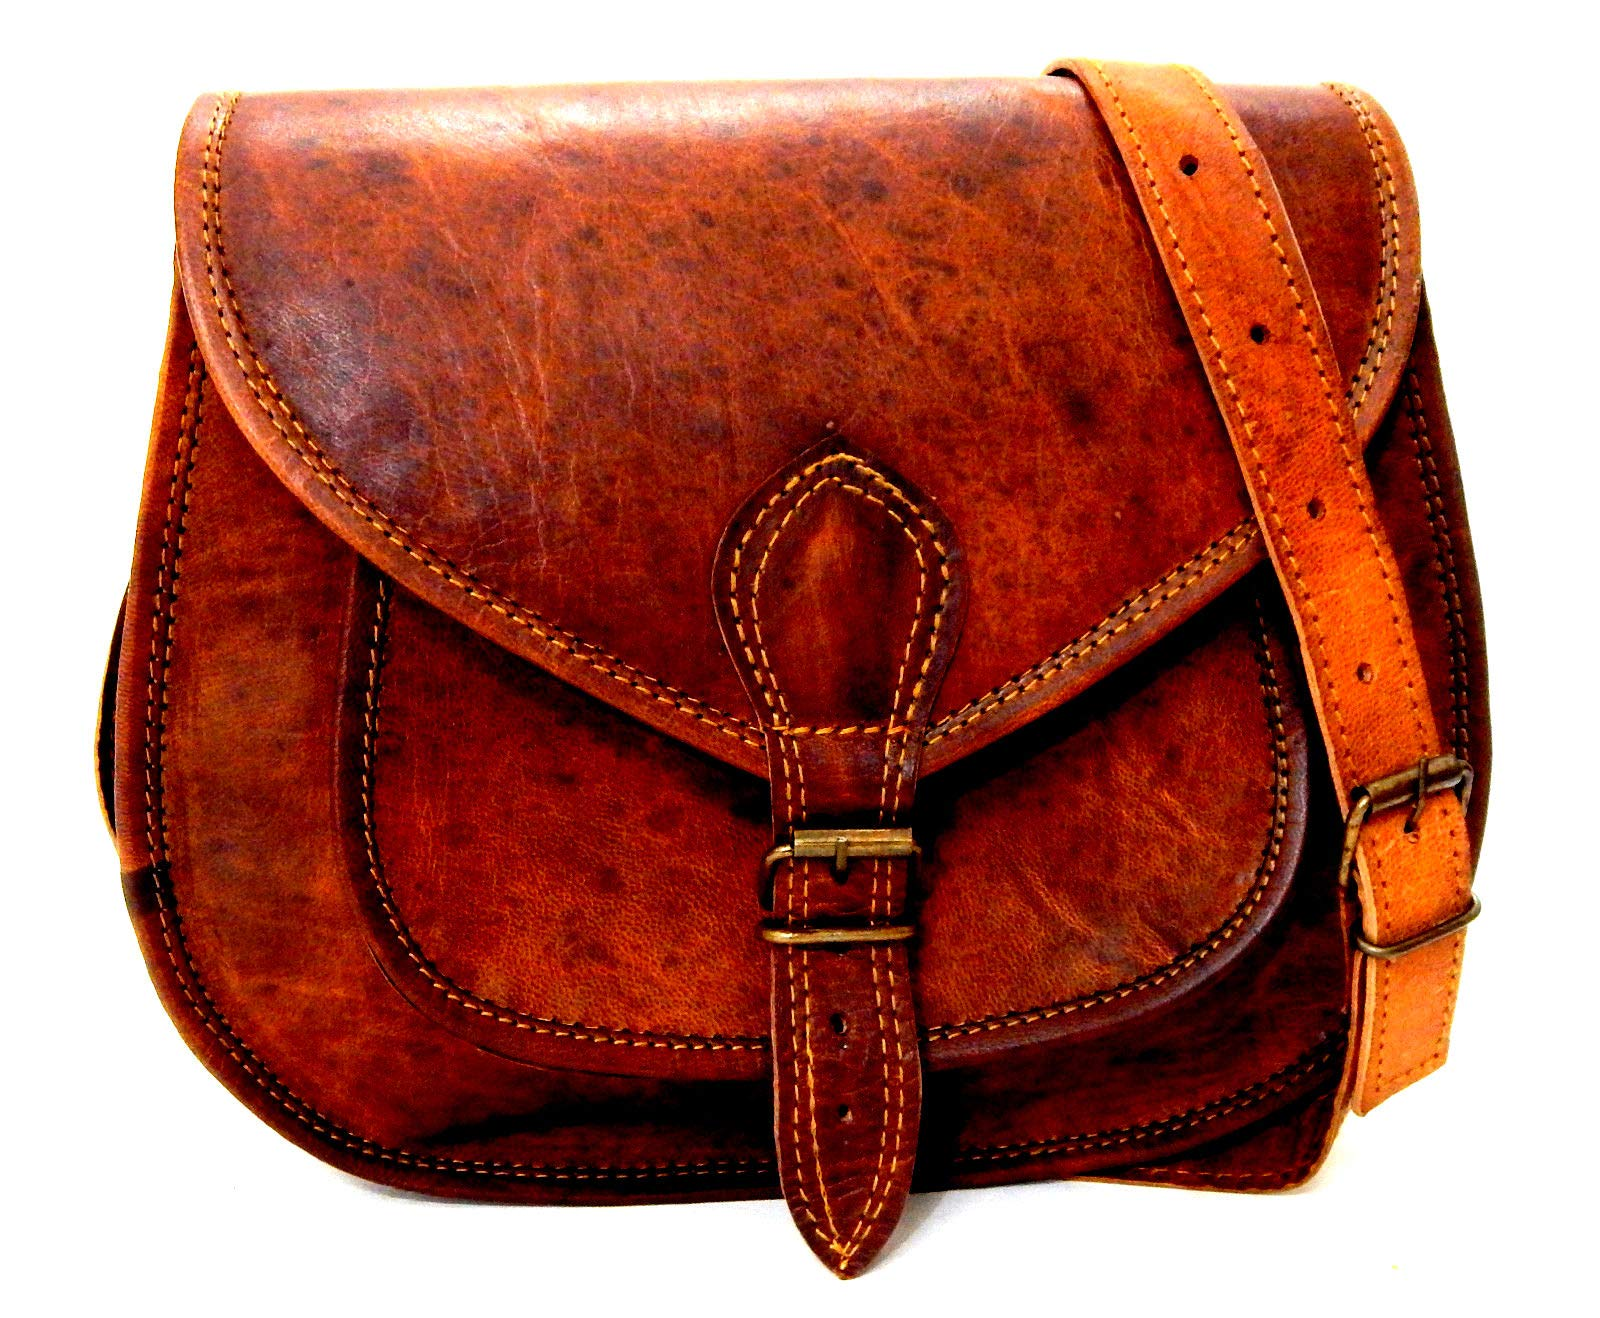 8c081dedc0fd4 Firu-Handmade Women Vintage Rustic Retro Style Genuine Brown Leather Cross  body Shoulder Bag Handmade Purse